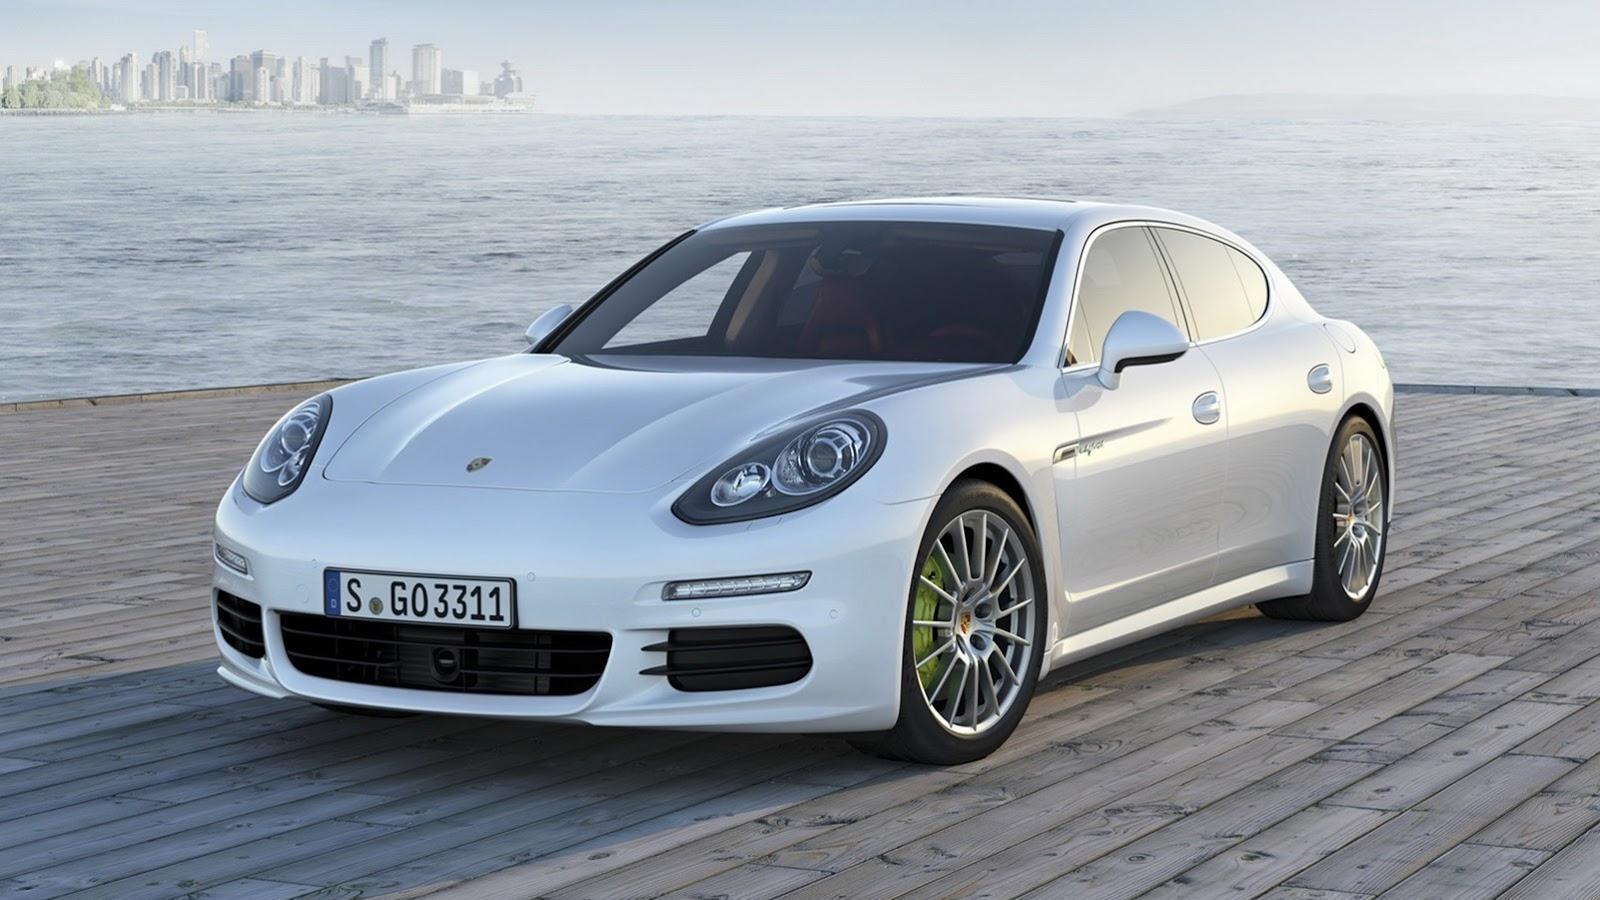 2014 Porsche Panamera leaked images